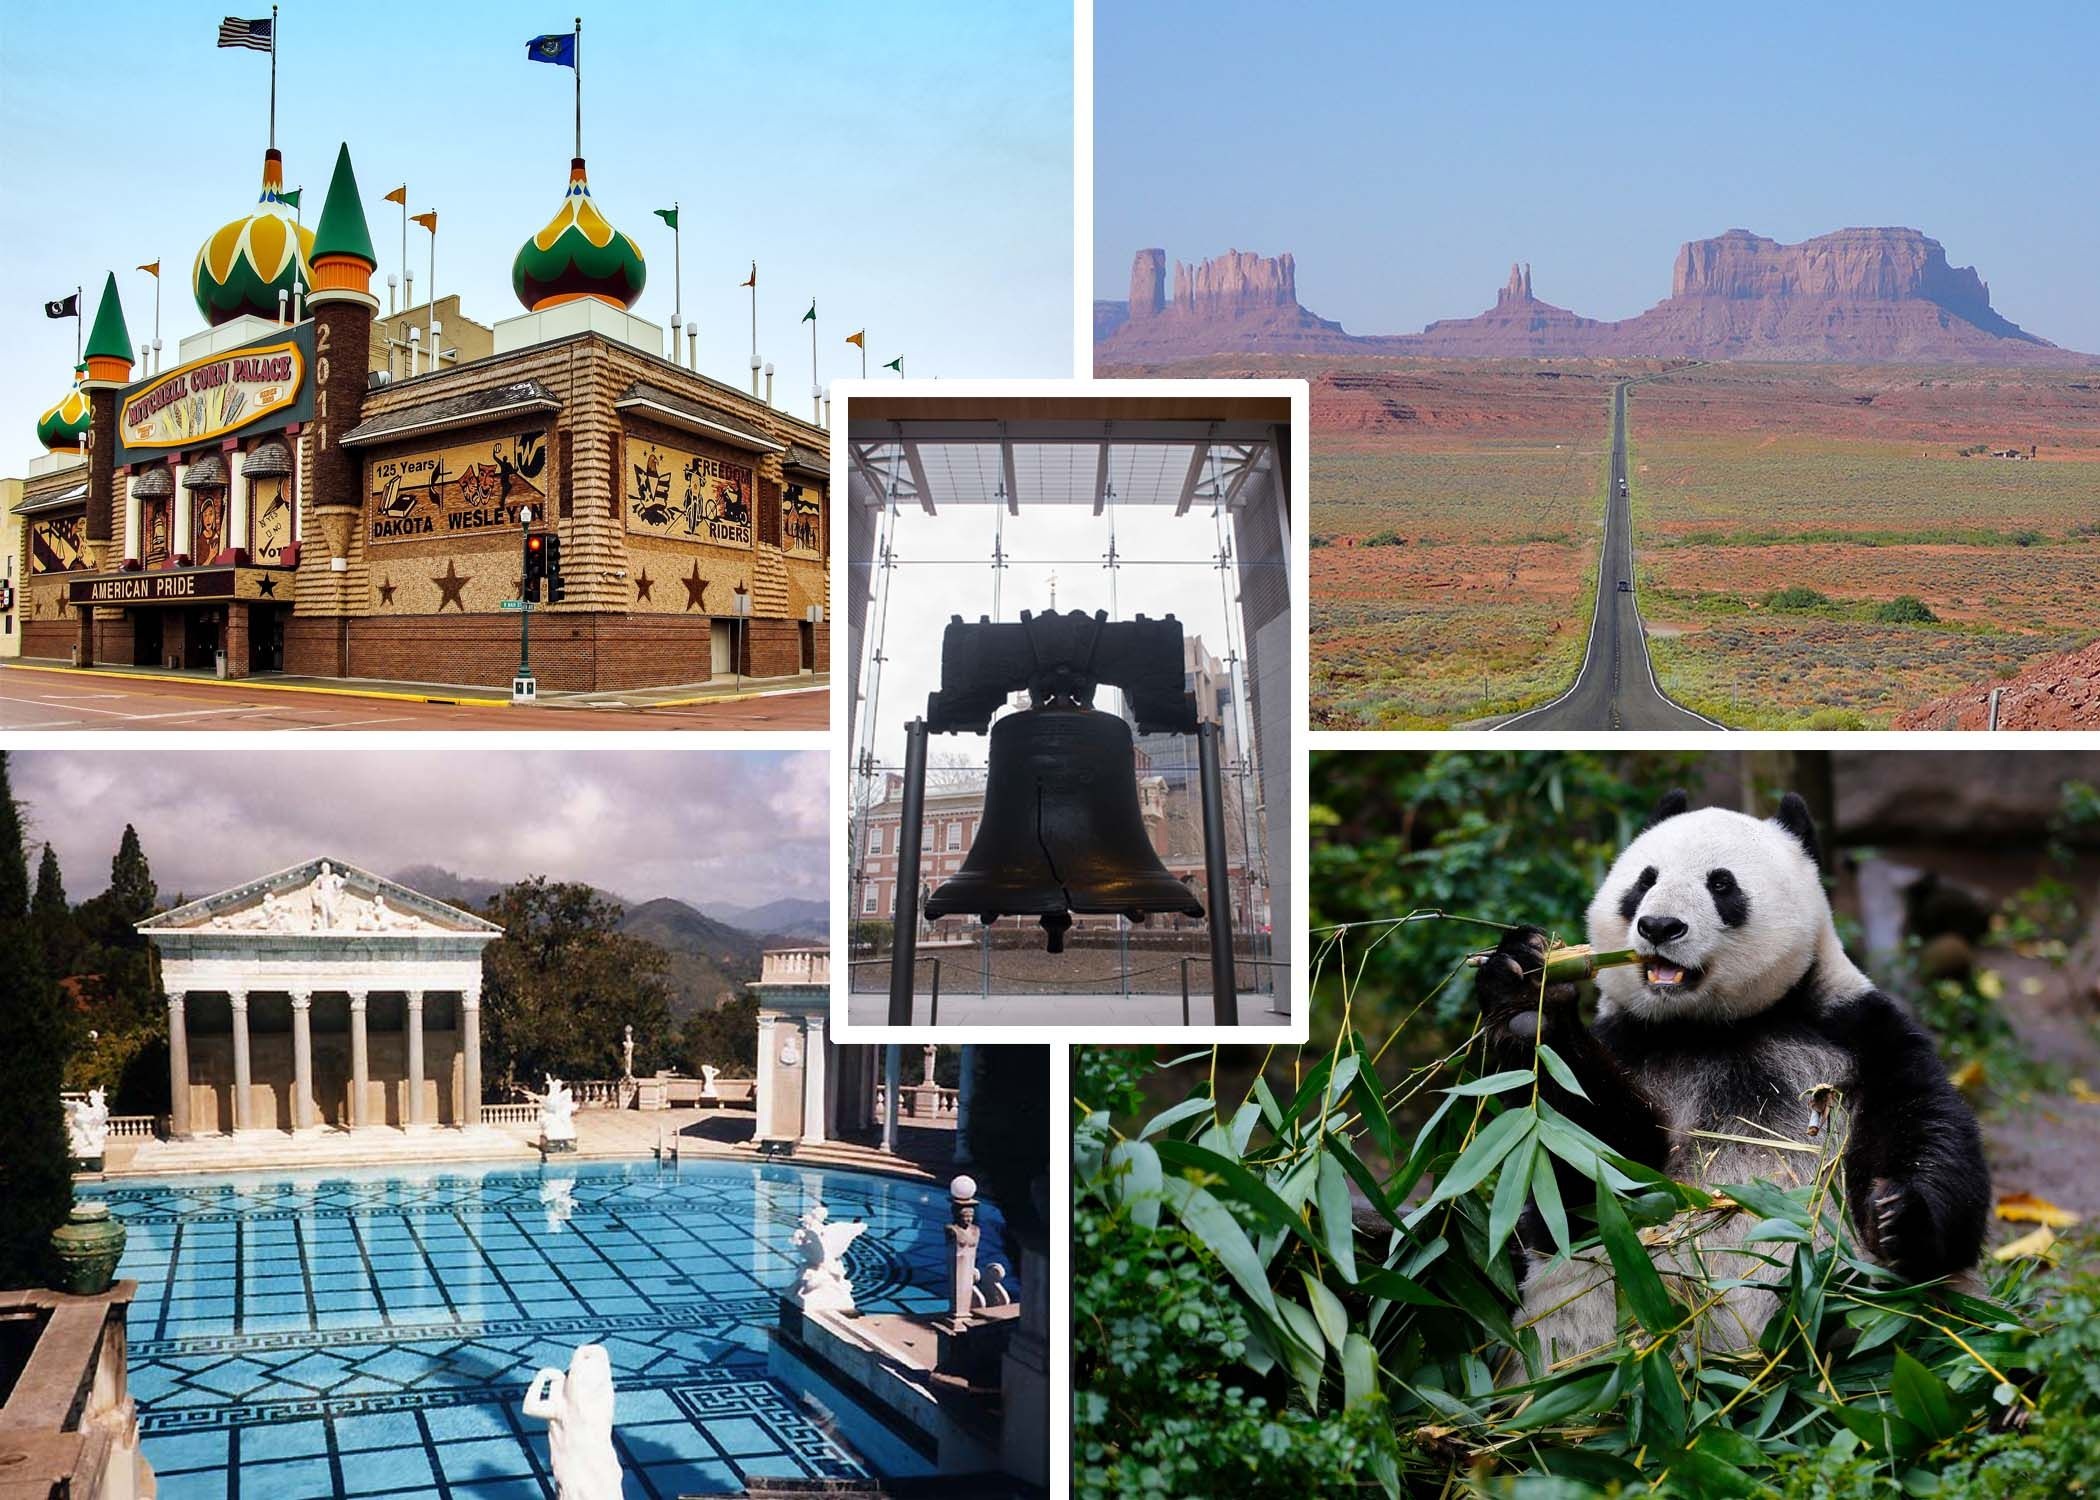 Summer Vacation 2018 Ideas: 50 Must Visit U.S. Travel Destinations